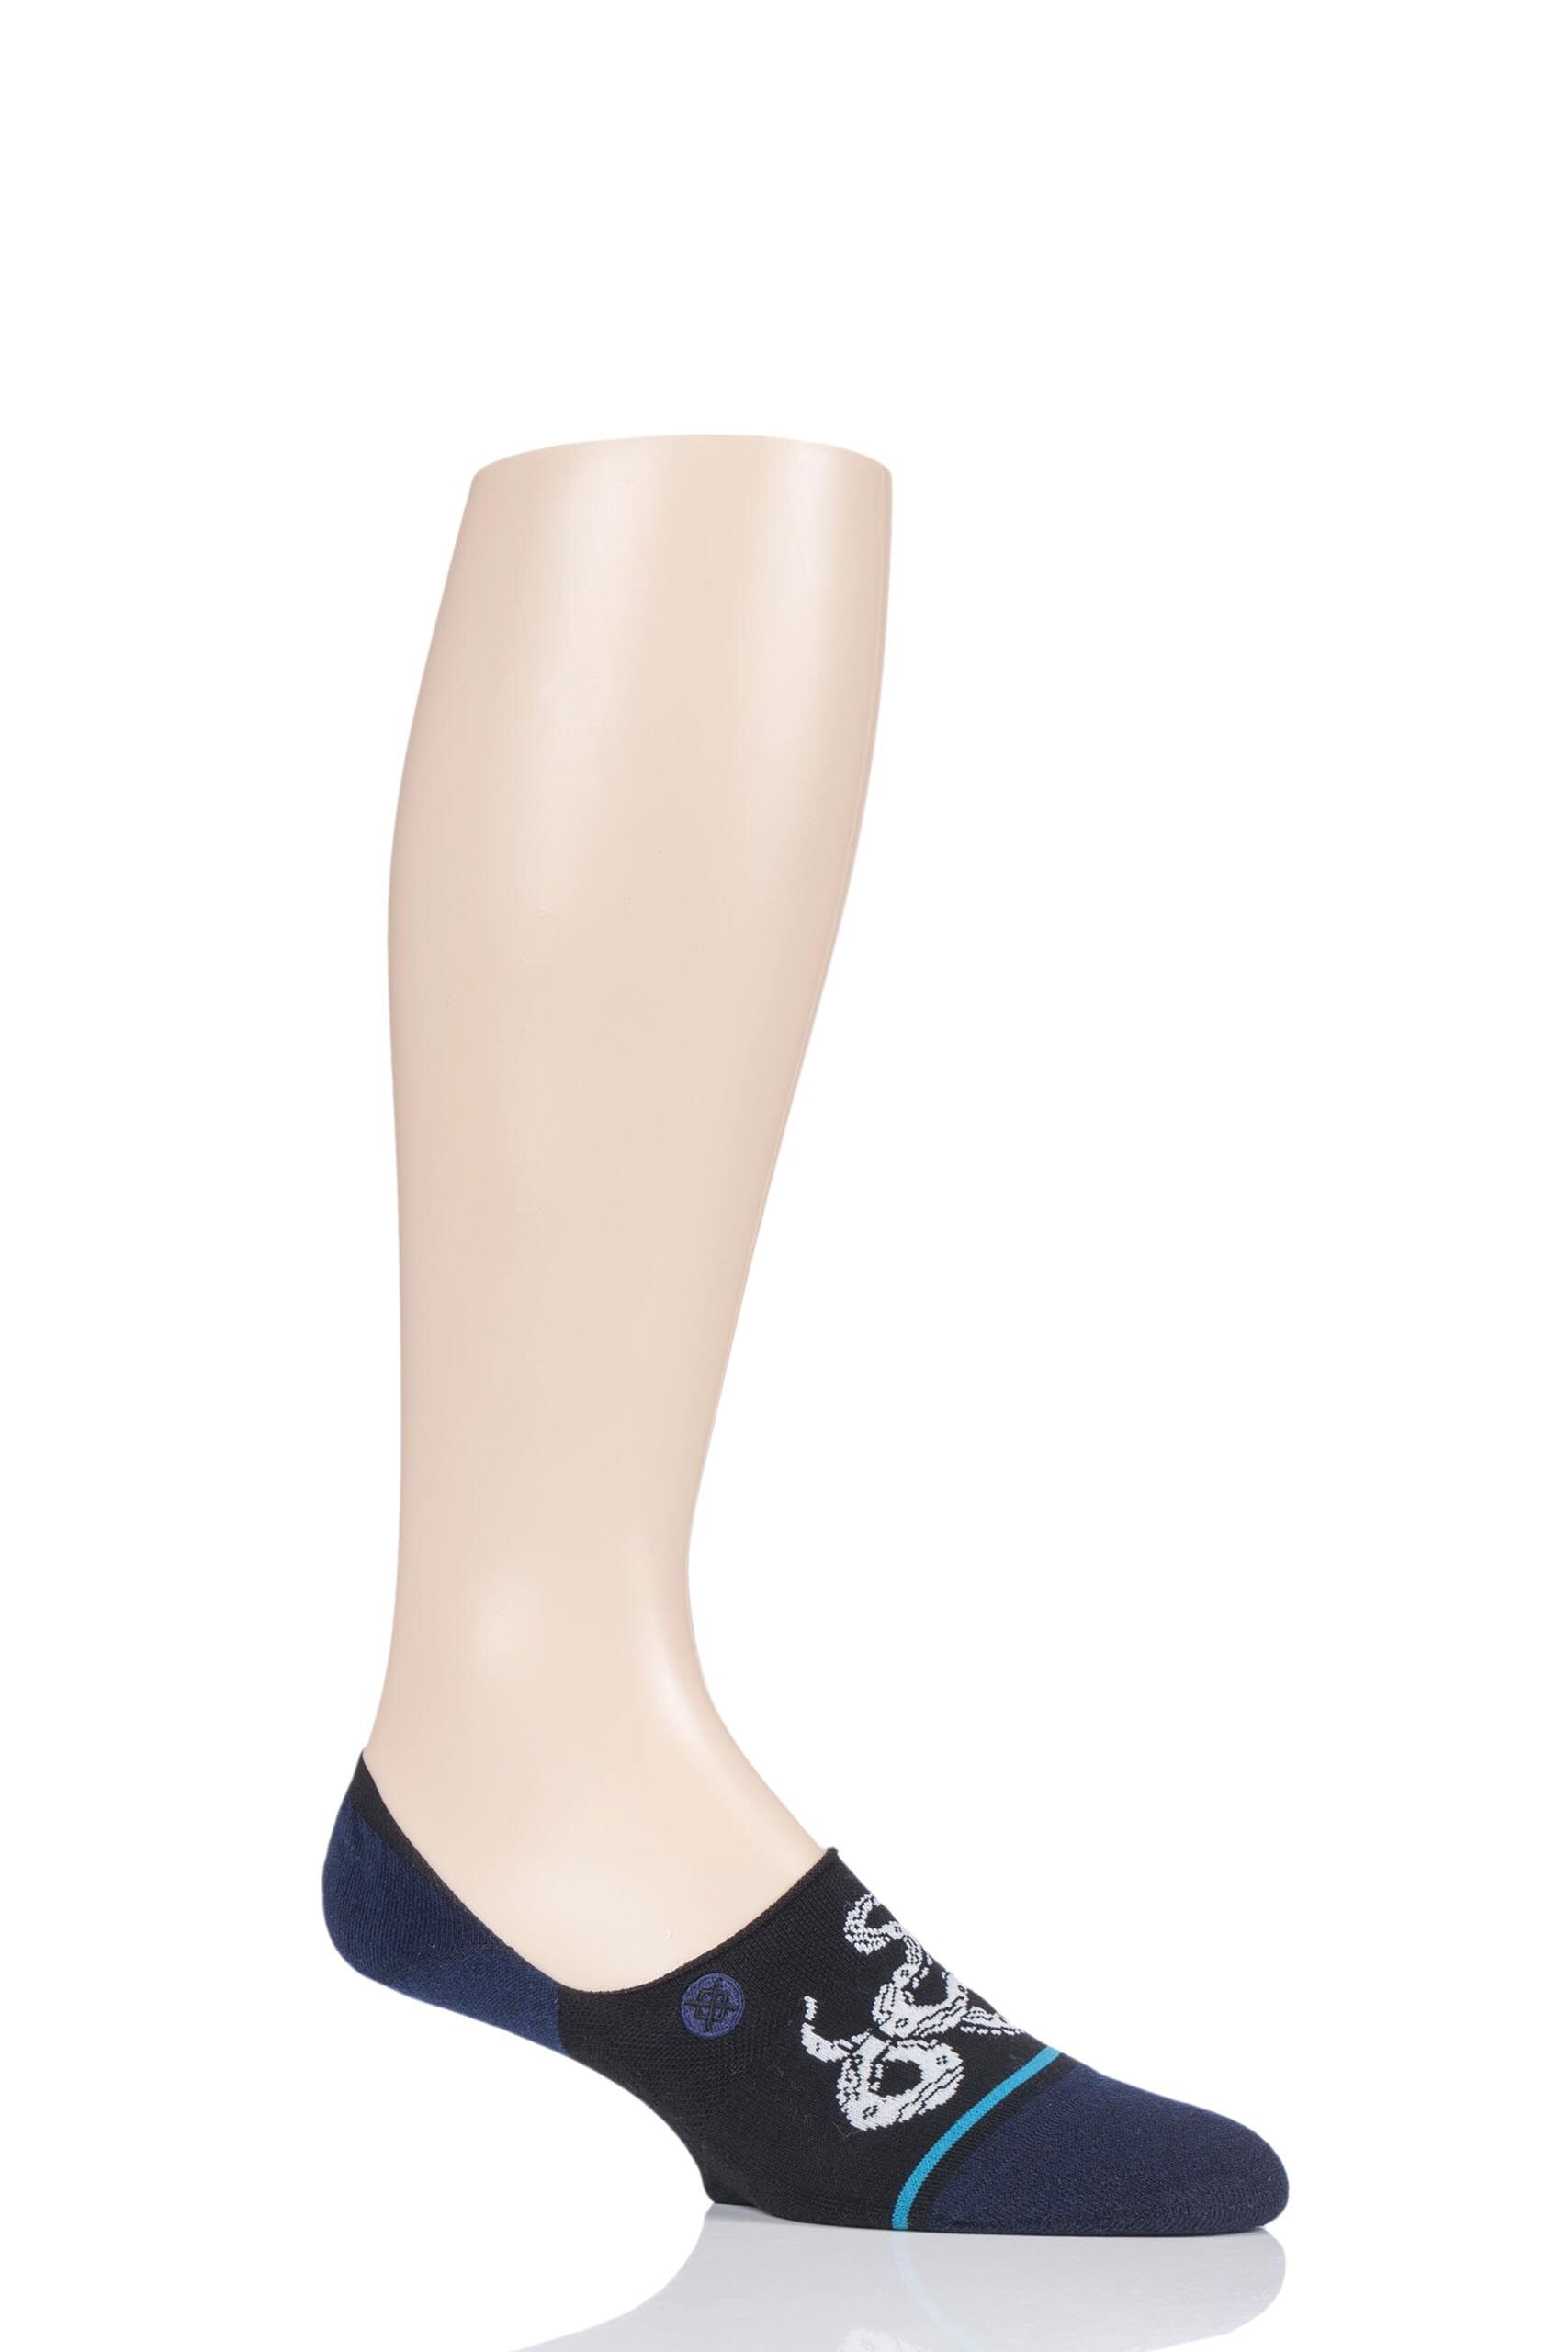 Image of 1 Pair Black Crotalus Cotton Socks Men's 5.5-8 Mens - Stance